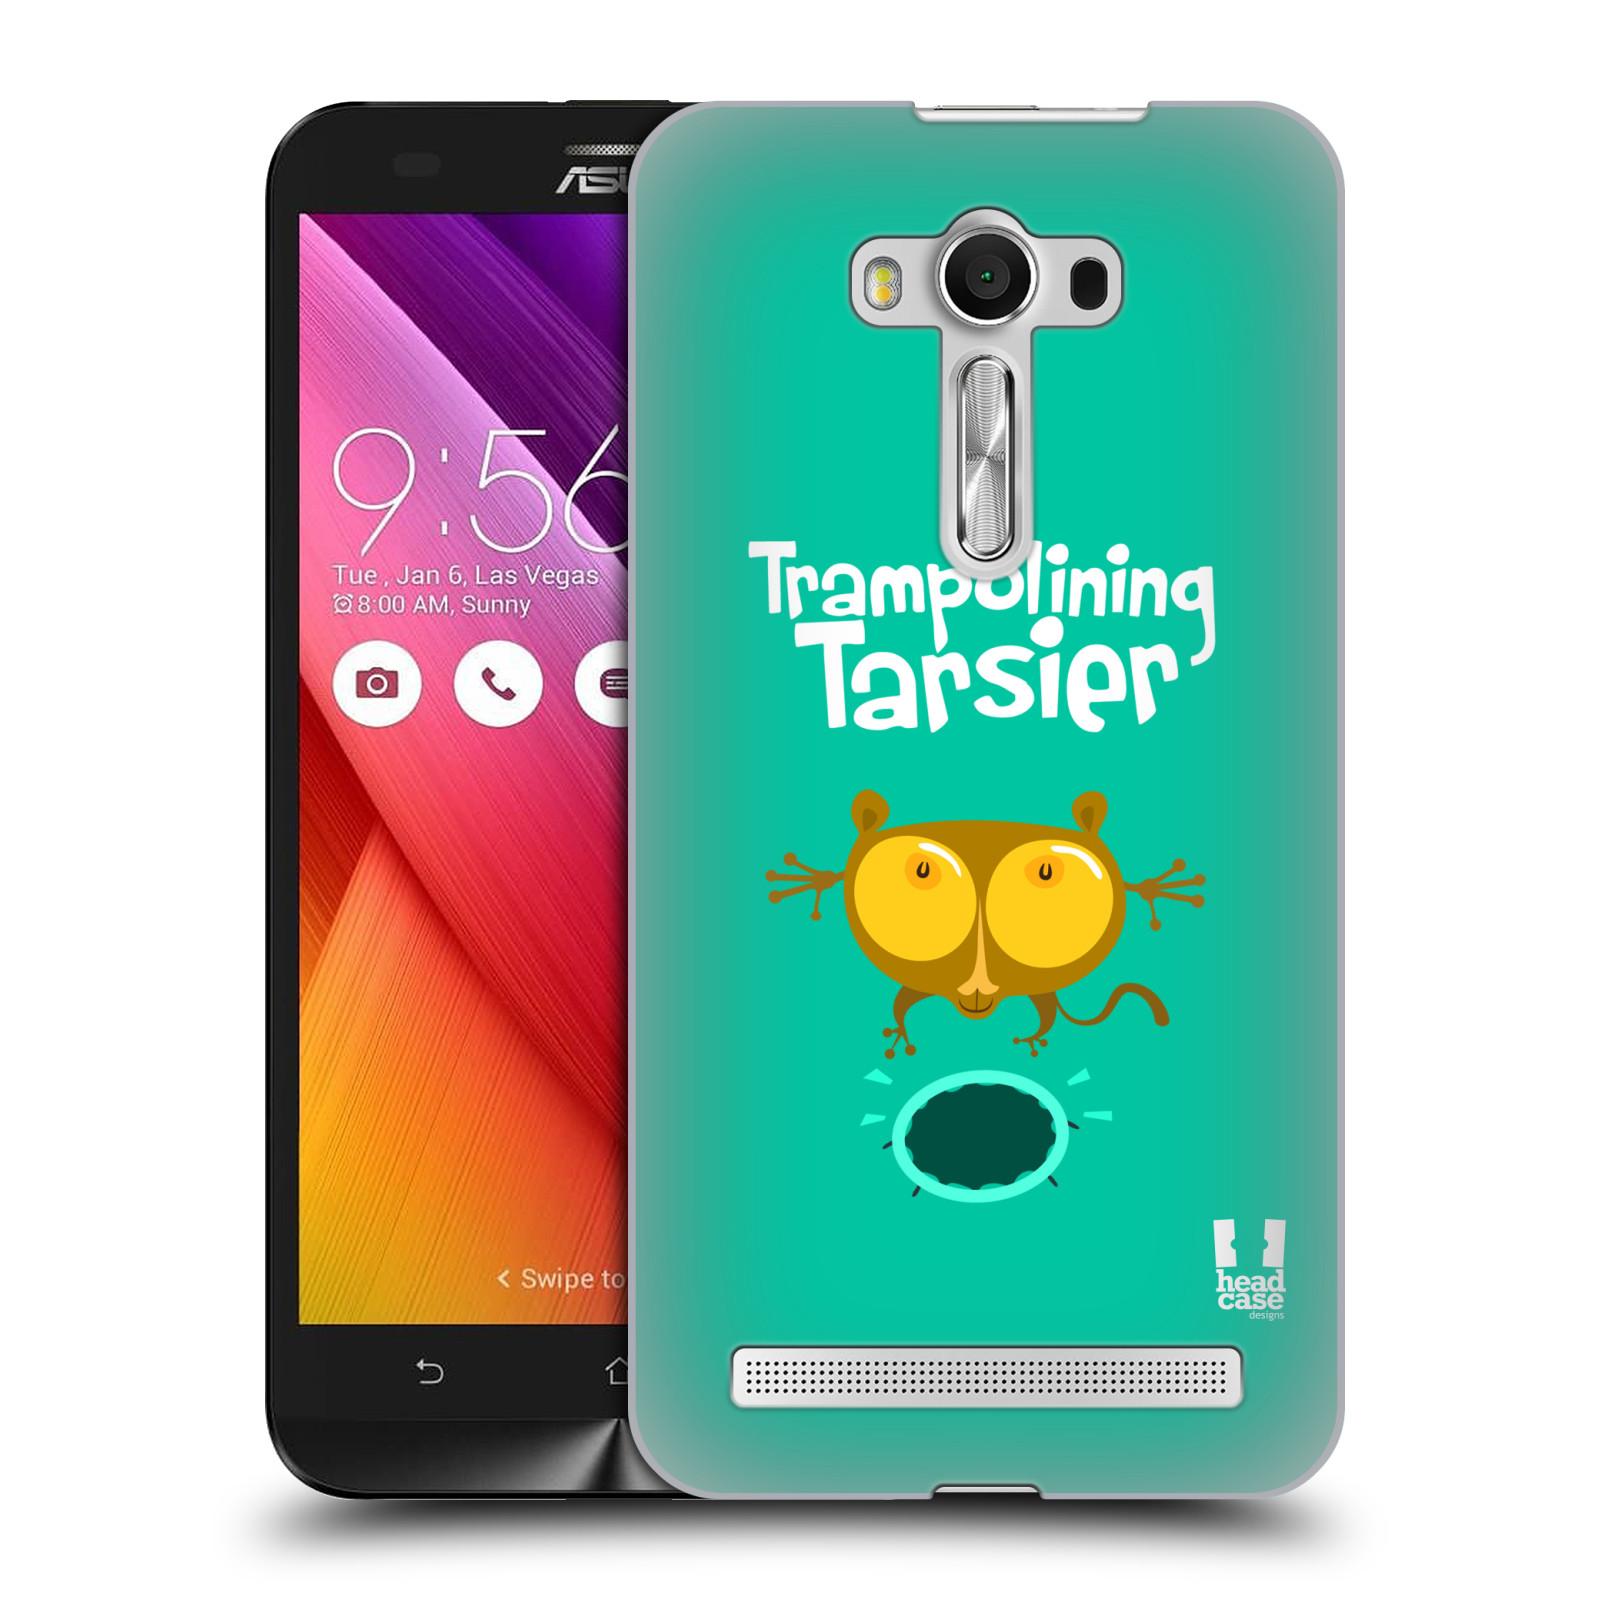 HEAD CASE plastový obal na mobil Asus Zenfone 2 LASER (5,5 displej ZE550KL) vzor Zvířátka atleti TARSIER (Nártoun)